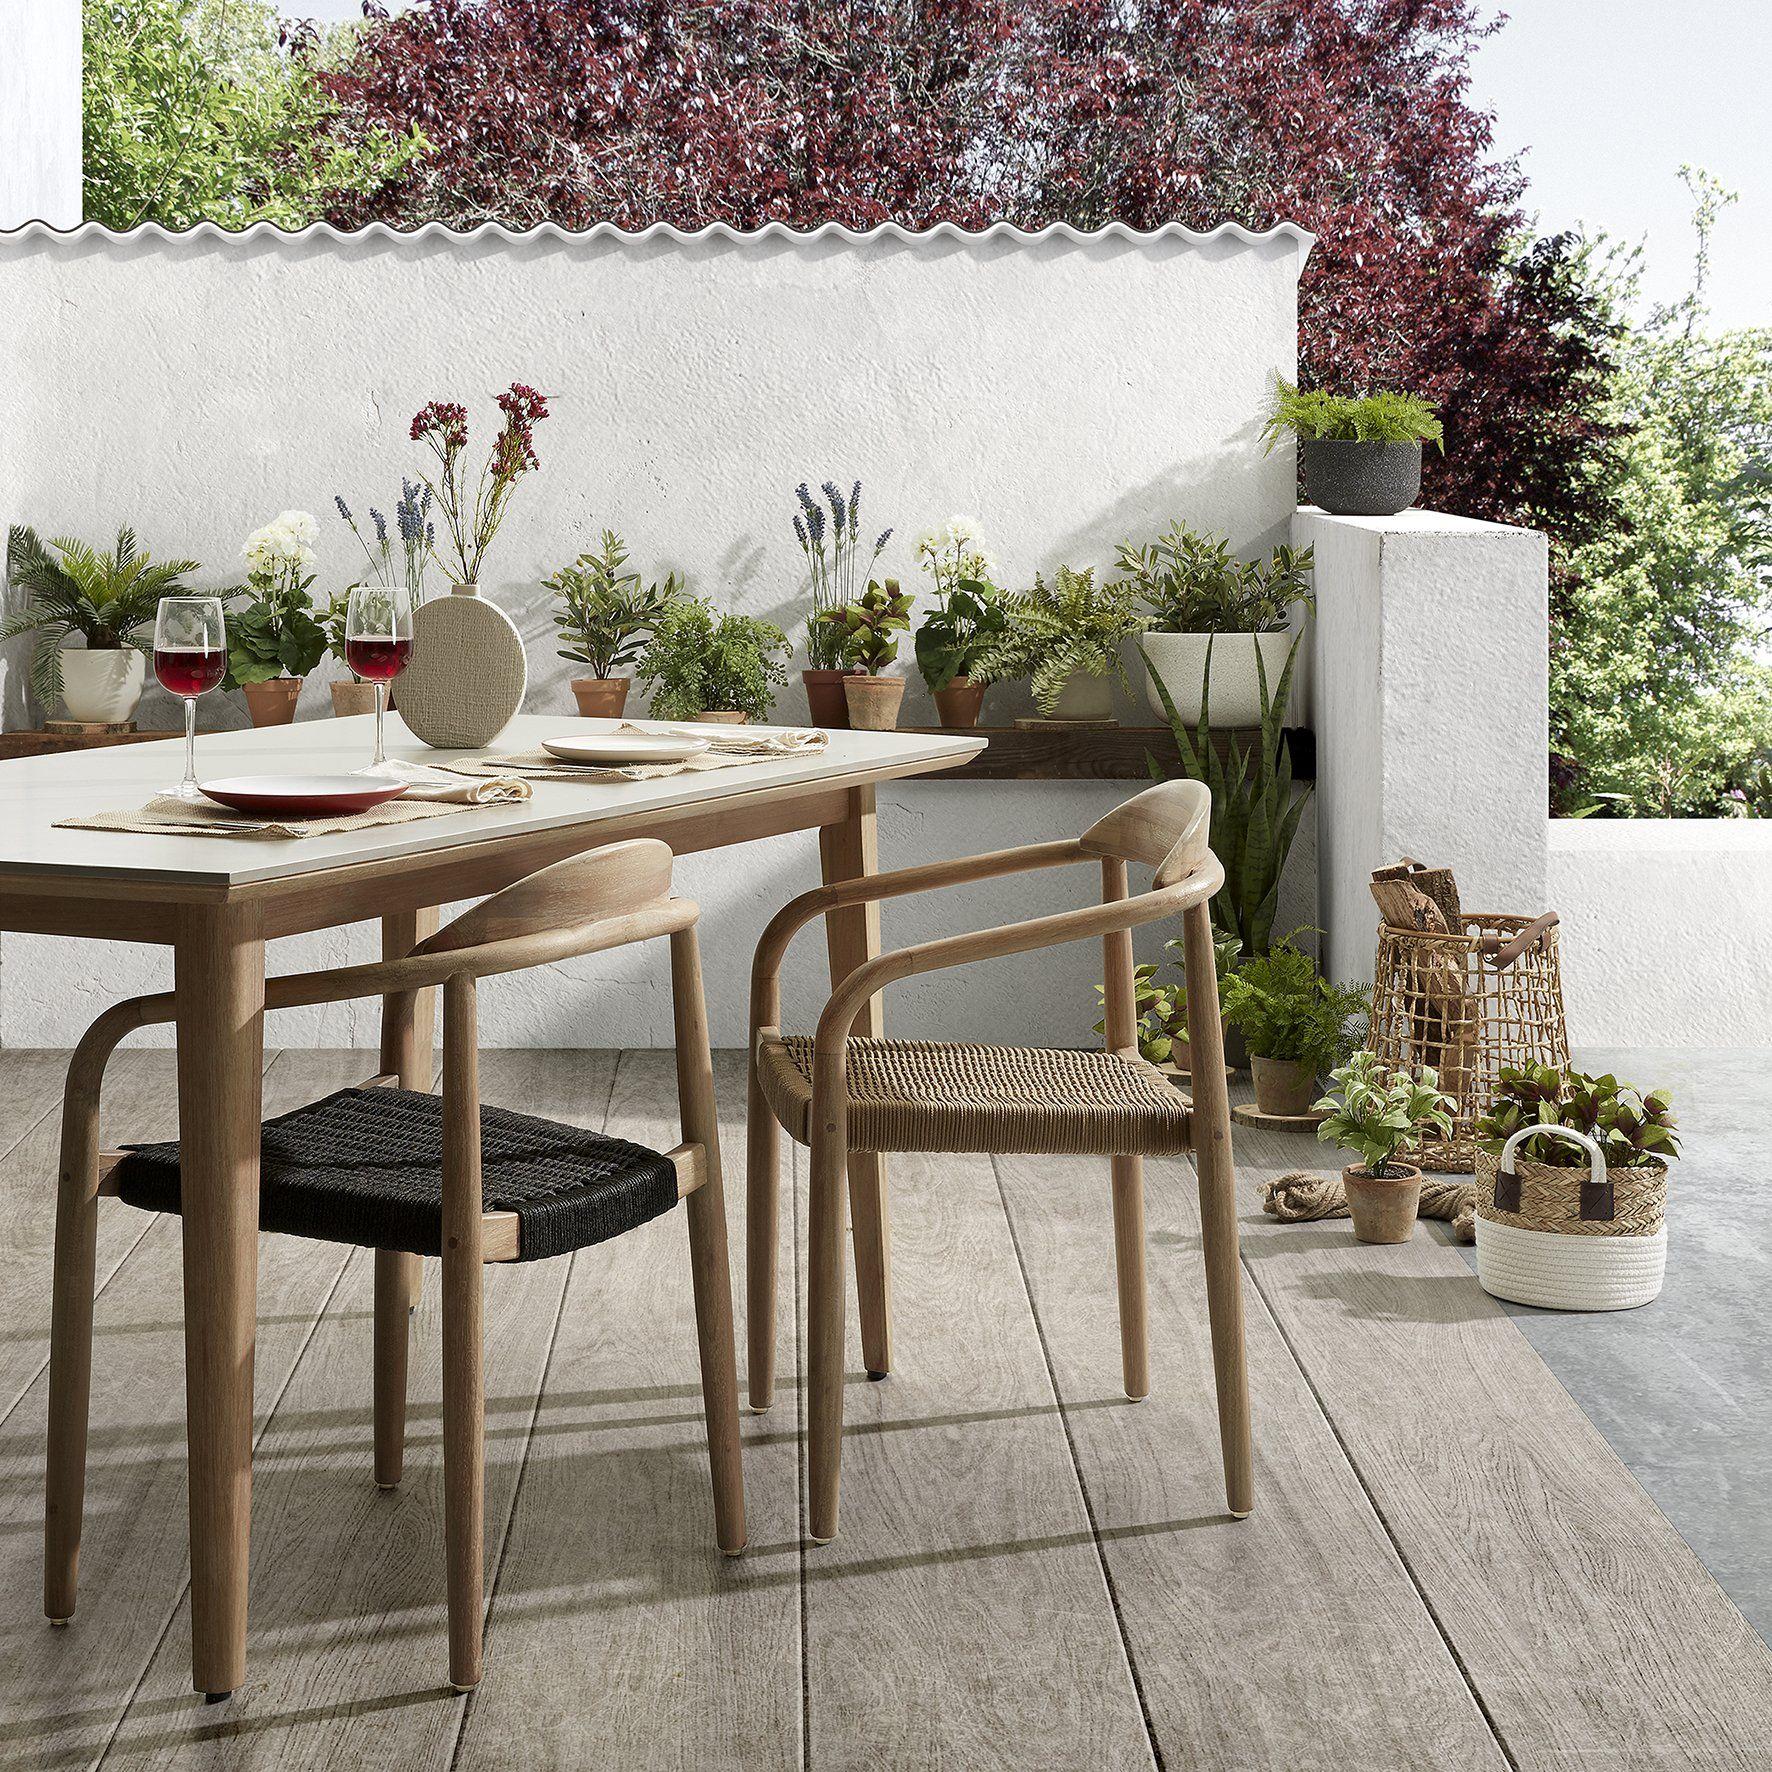 Une Table De Jardin Table De Jardin Mobilier Jardin Meuble